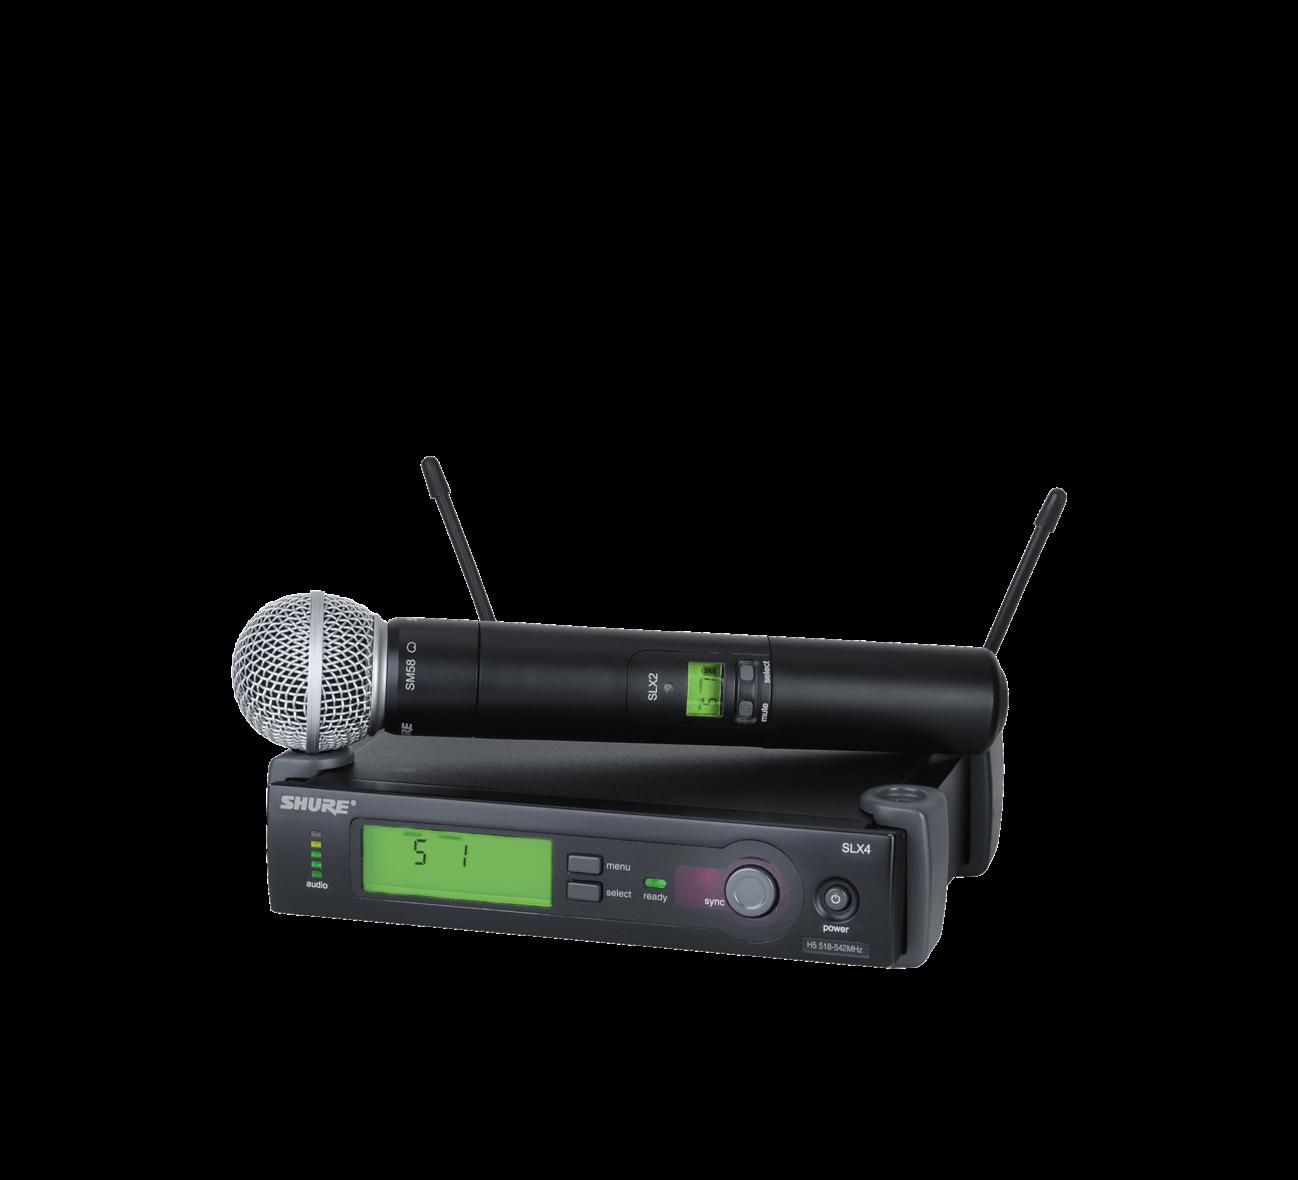 Shure SLX24/SM58 Handheld Wireless Microphone System - J3 Band